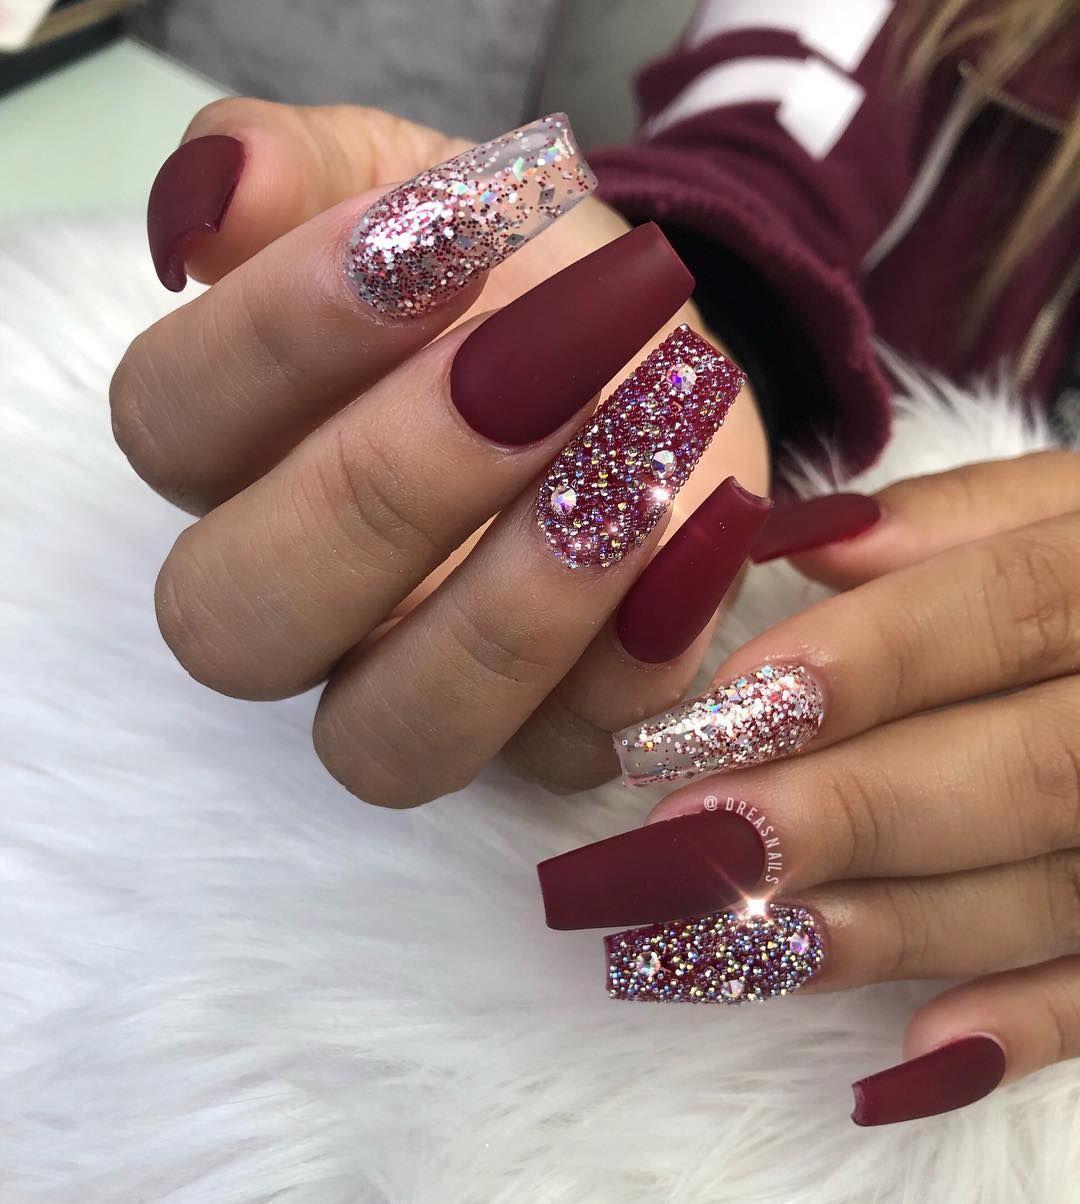 𝑨𝒏𝒅𝒓𝒆𝒂 𝑶 On Instagram Matte Burgundy Dailycharme Coffinnails Acrylicnails Mattenails Coffin Shape Nails Nail Designs Burgundy Nails